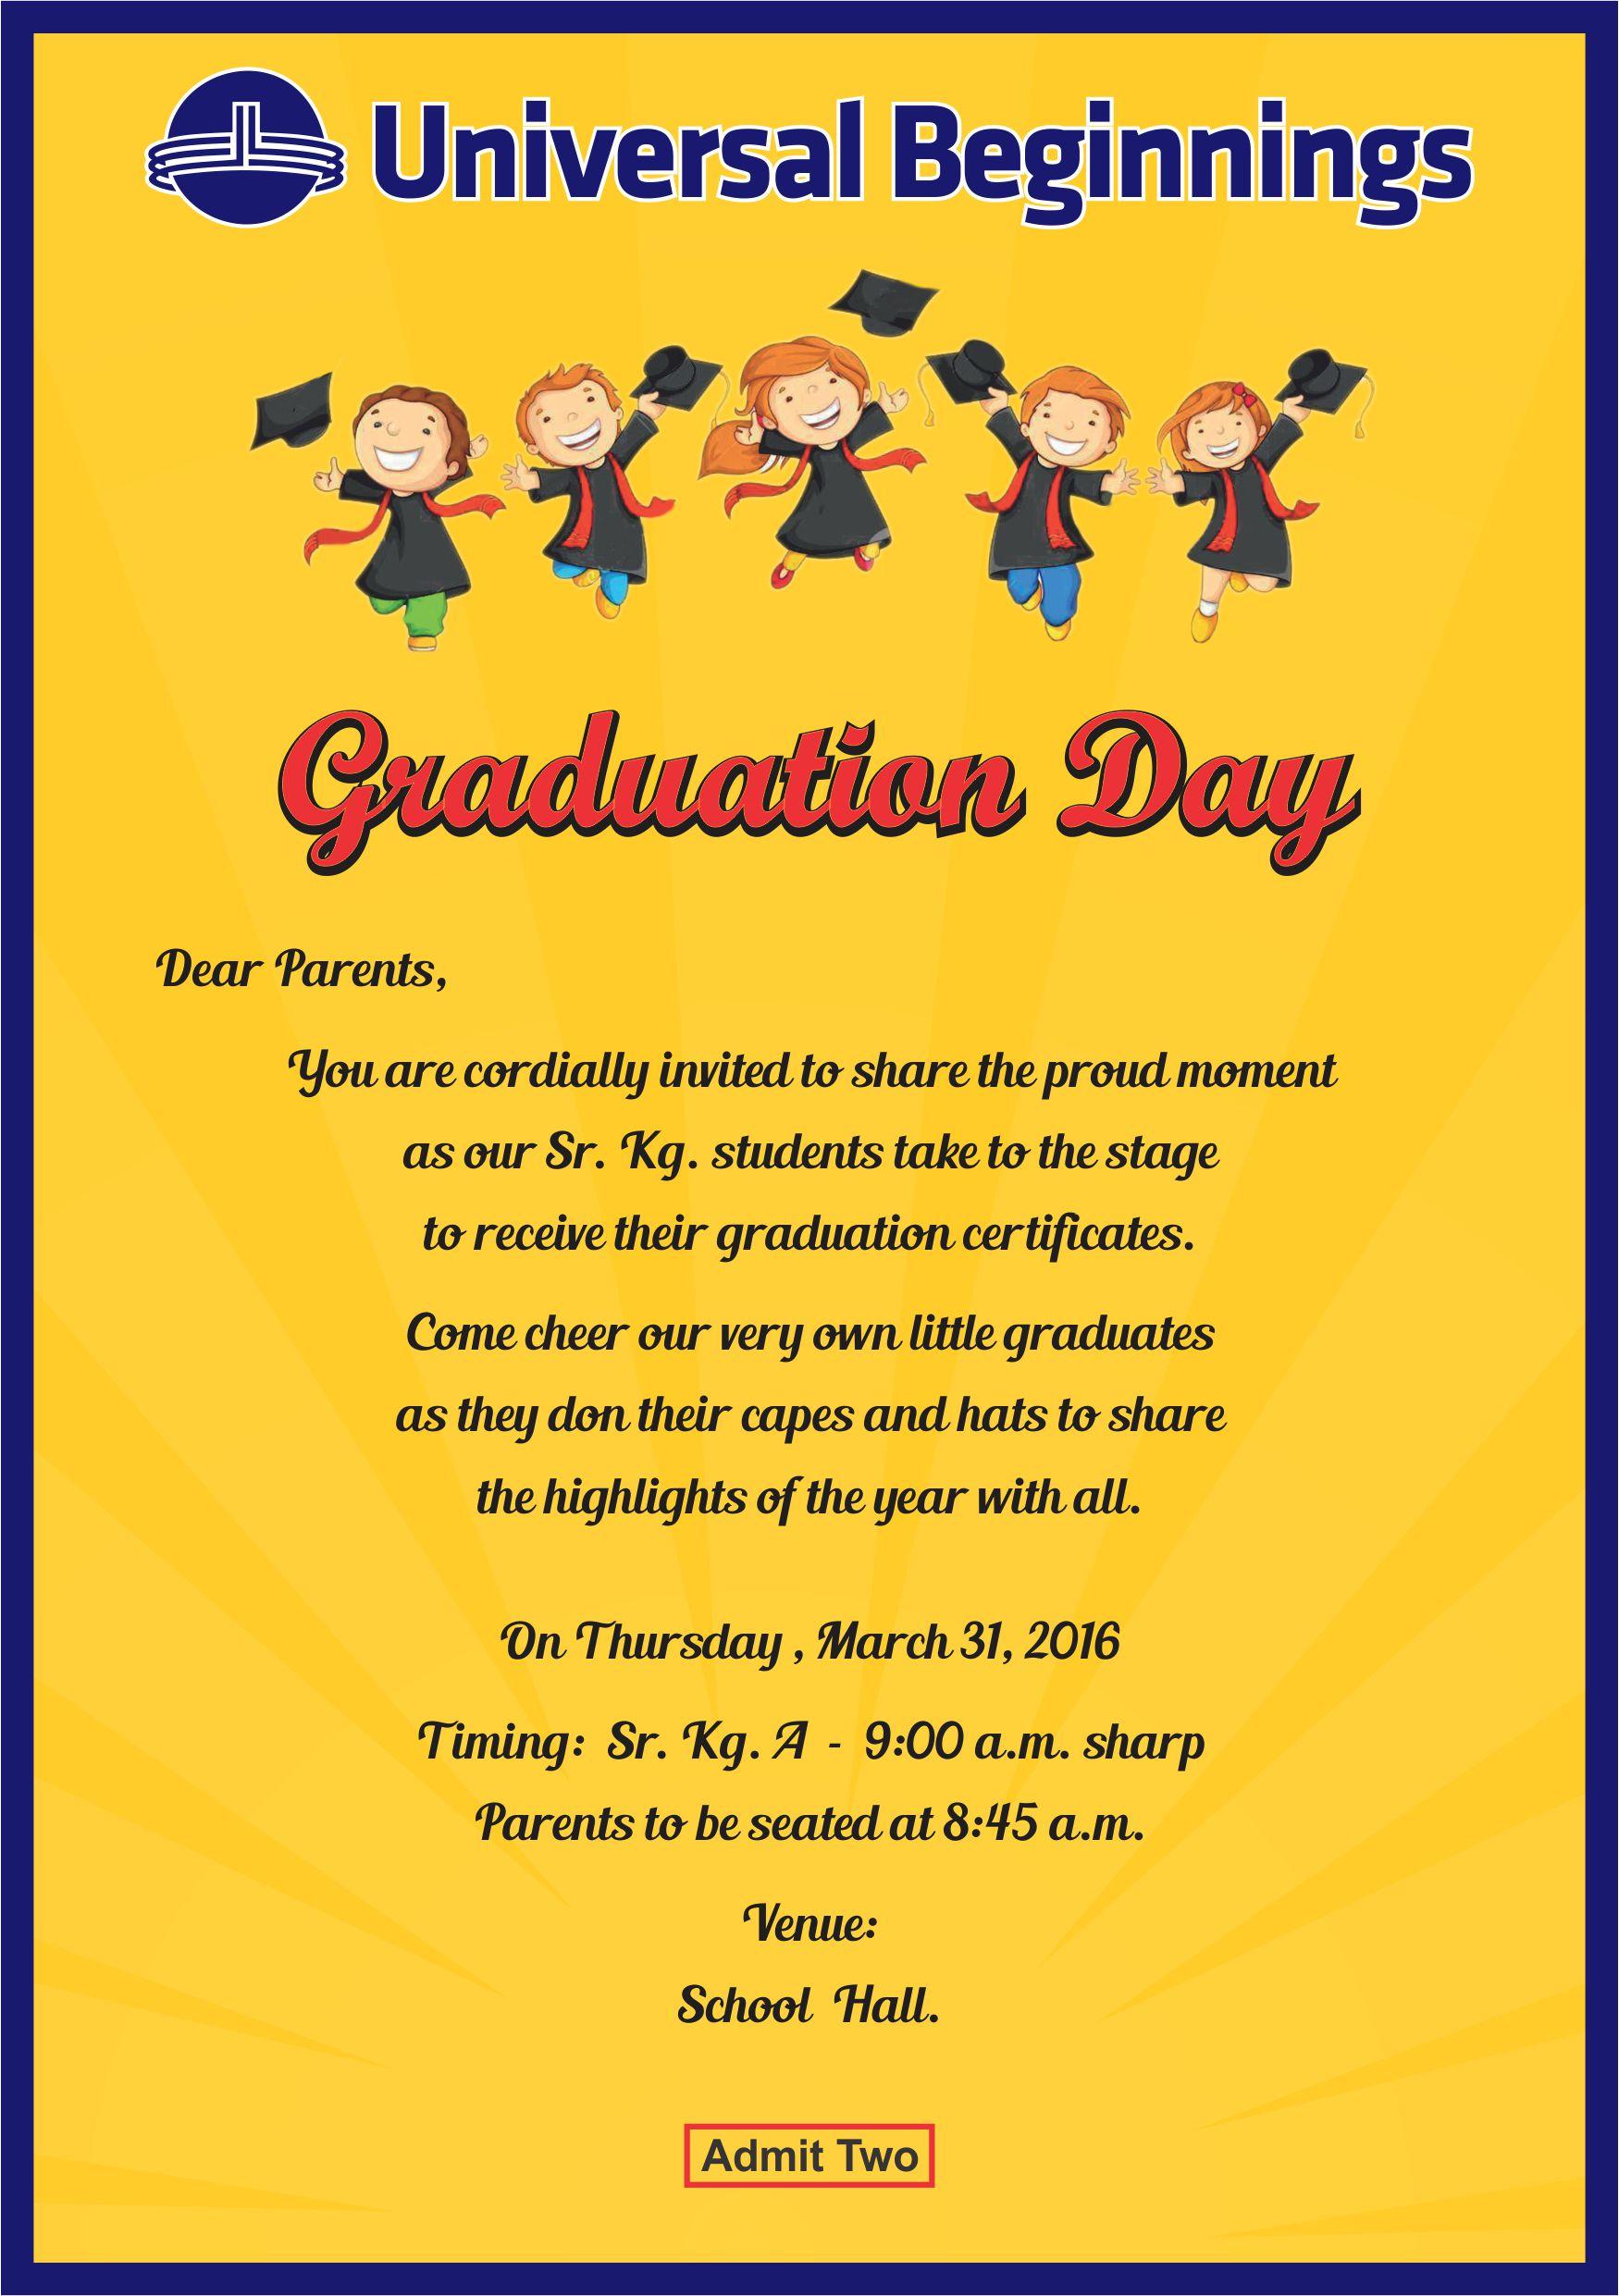 sr kg a  u2013 invitation for graduation day